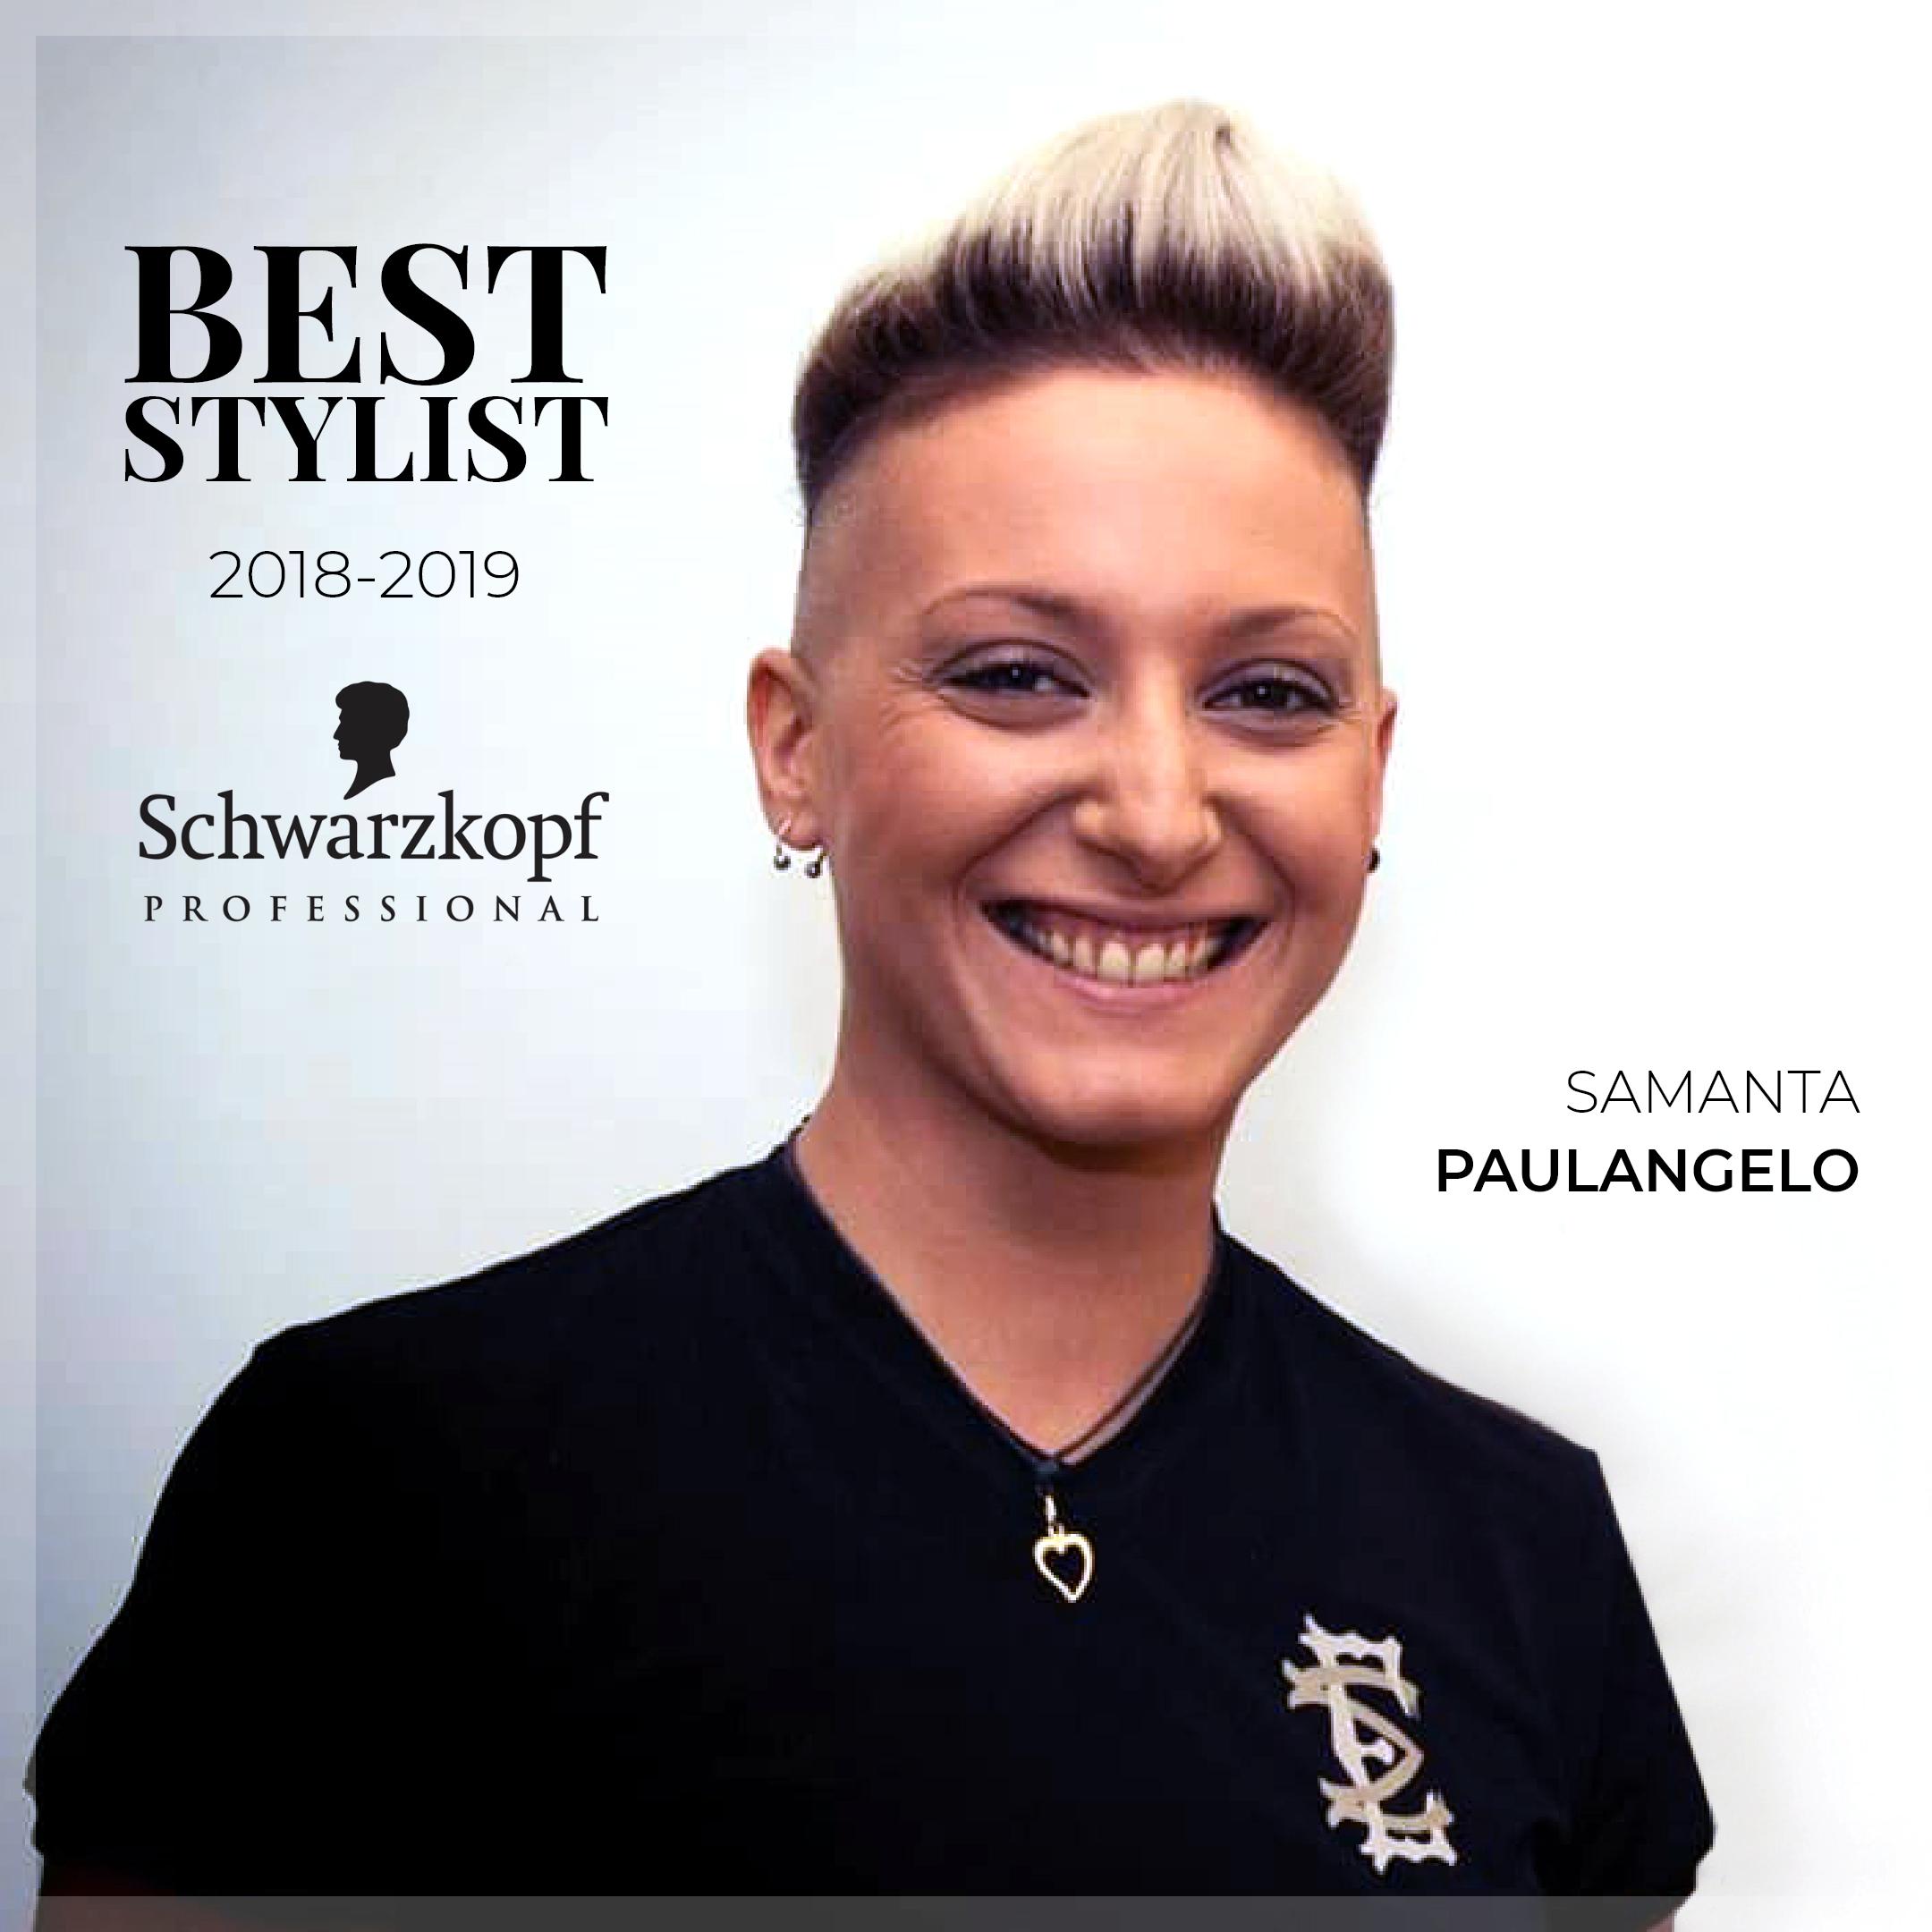 Best Stylist 2018-2019 Schwarzkopf Professional